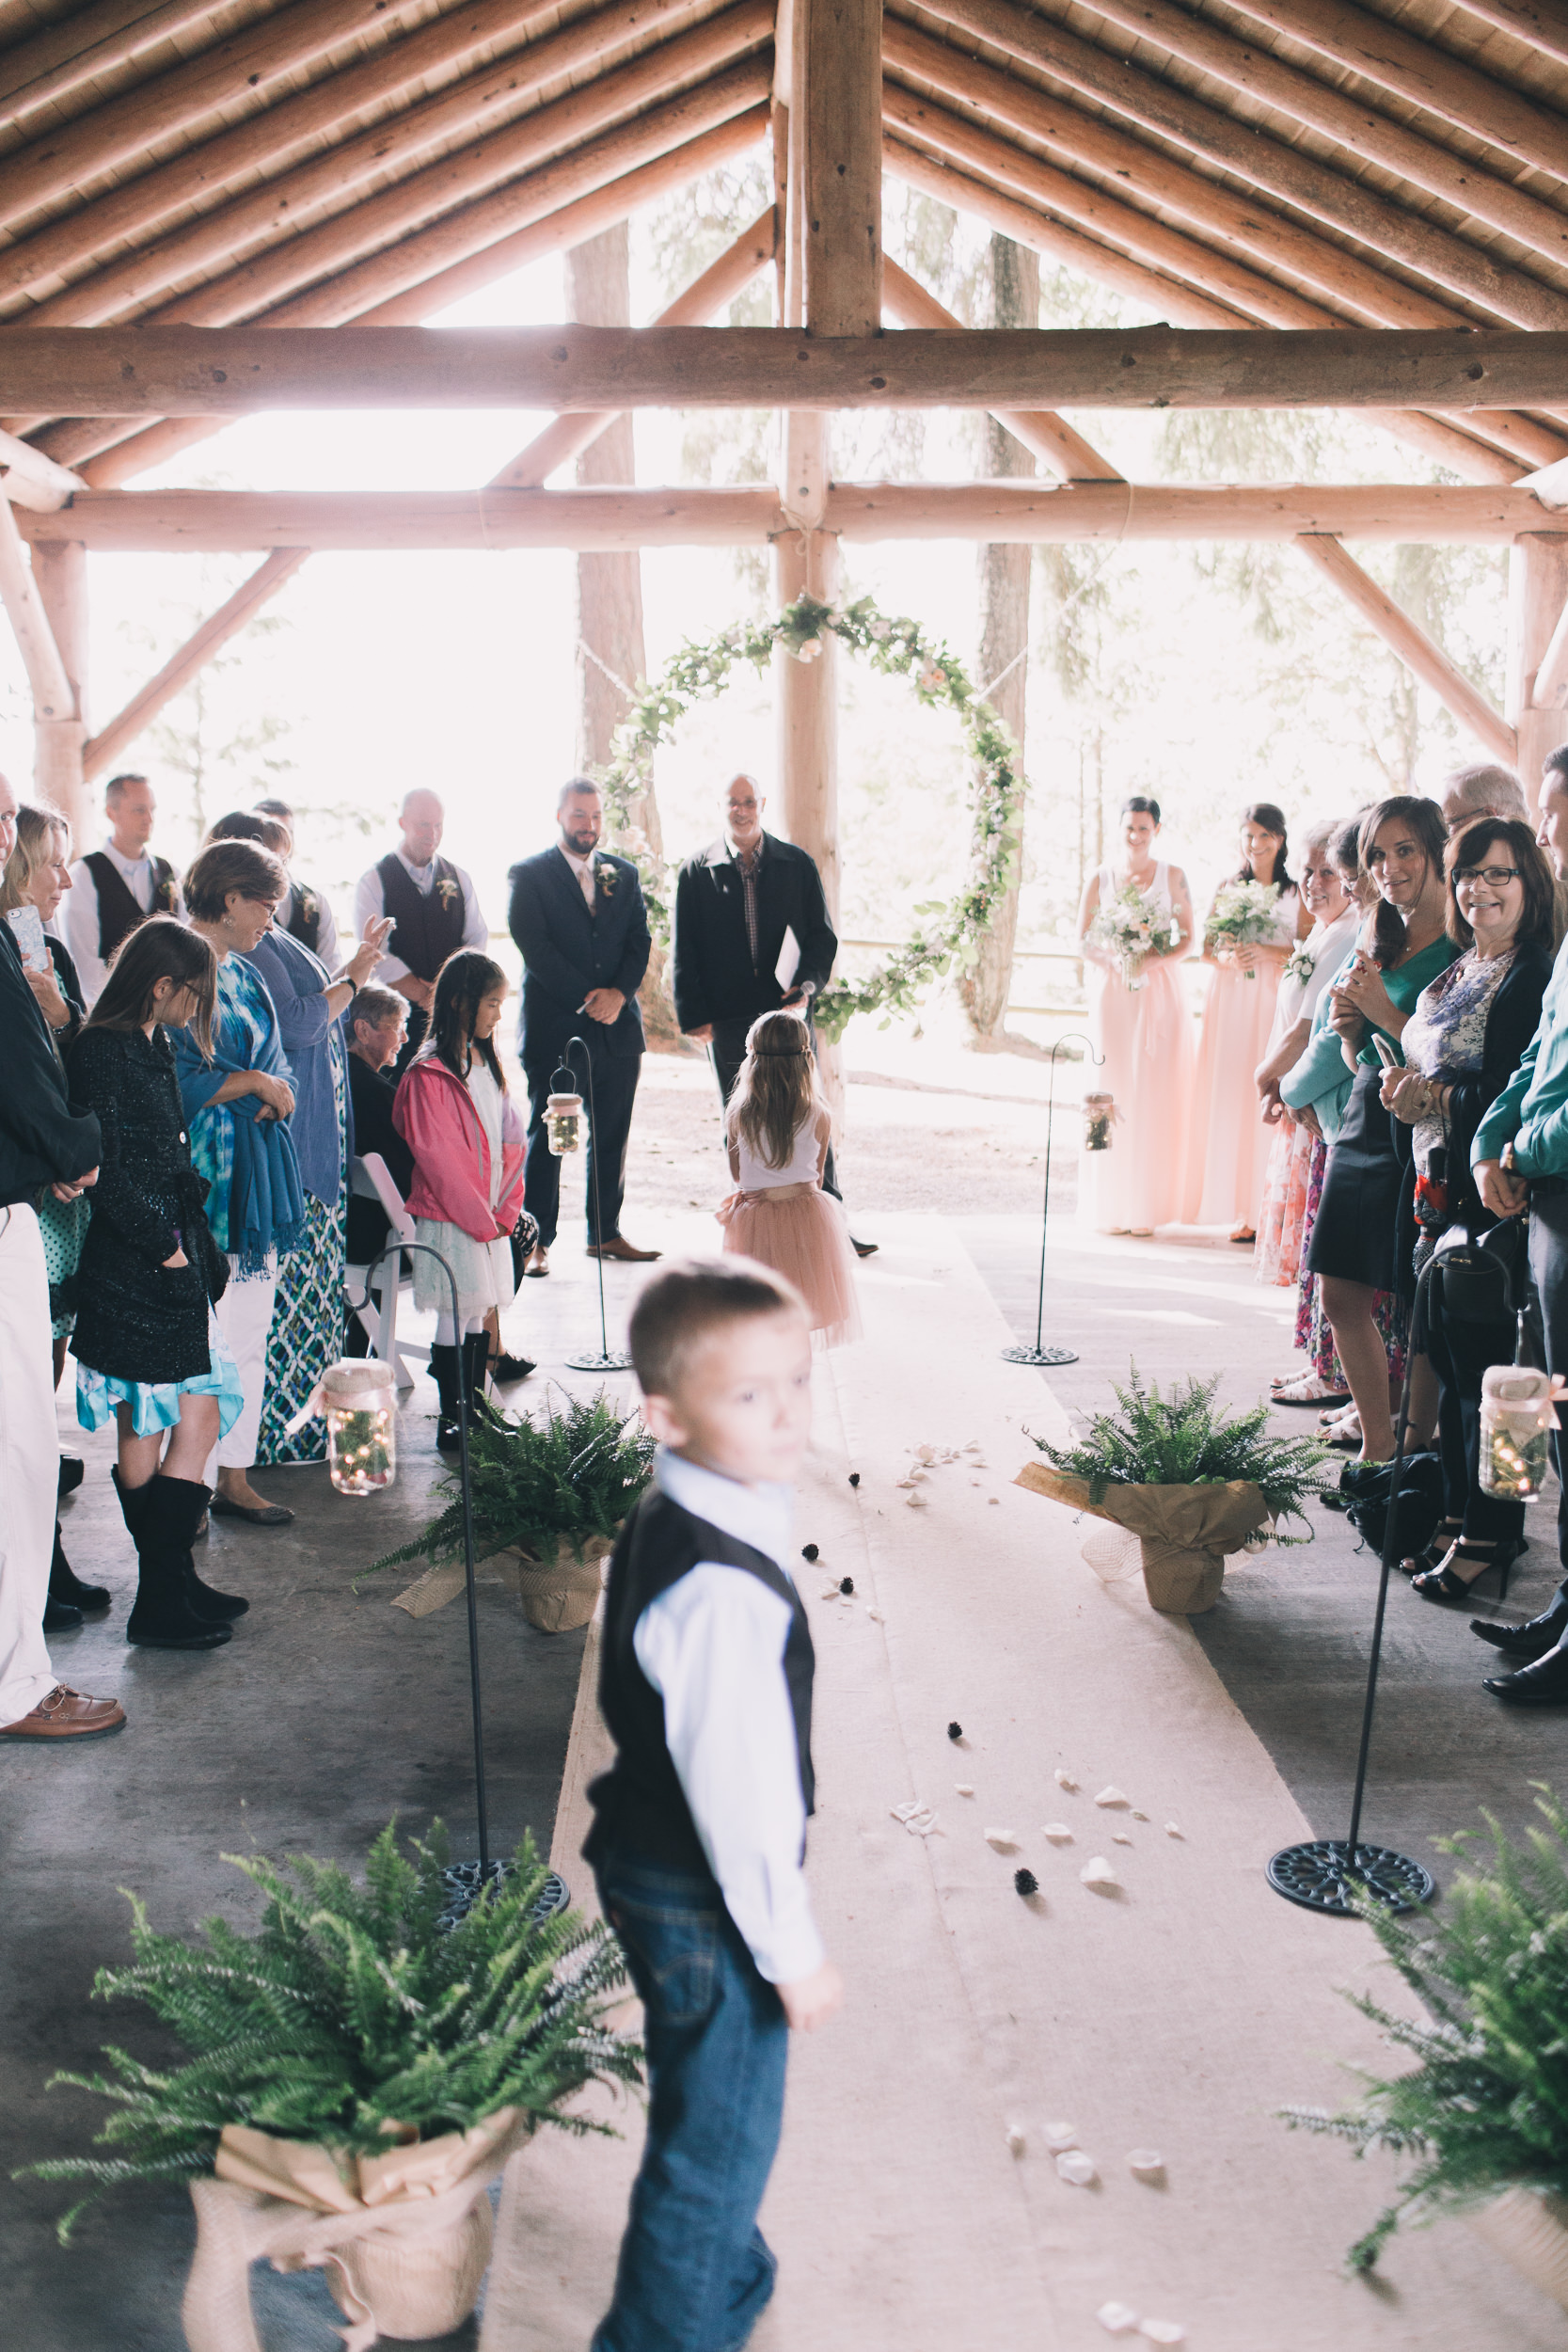 kitsap memorial state park log hall wedding ceremony